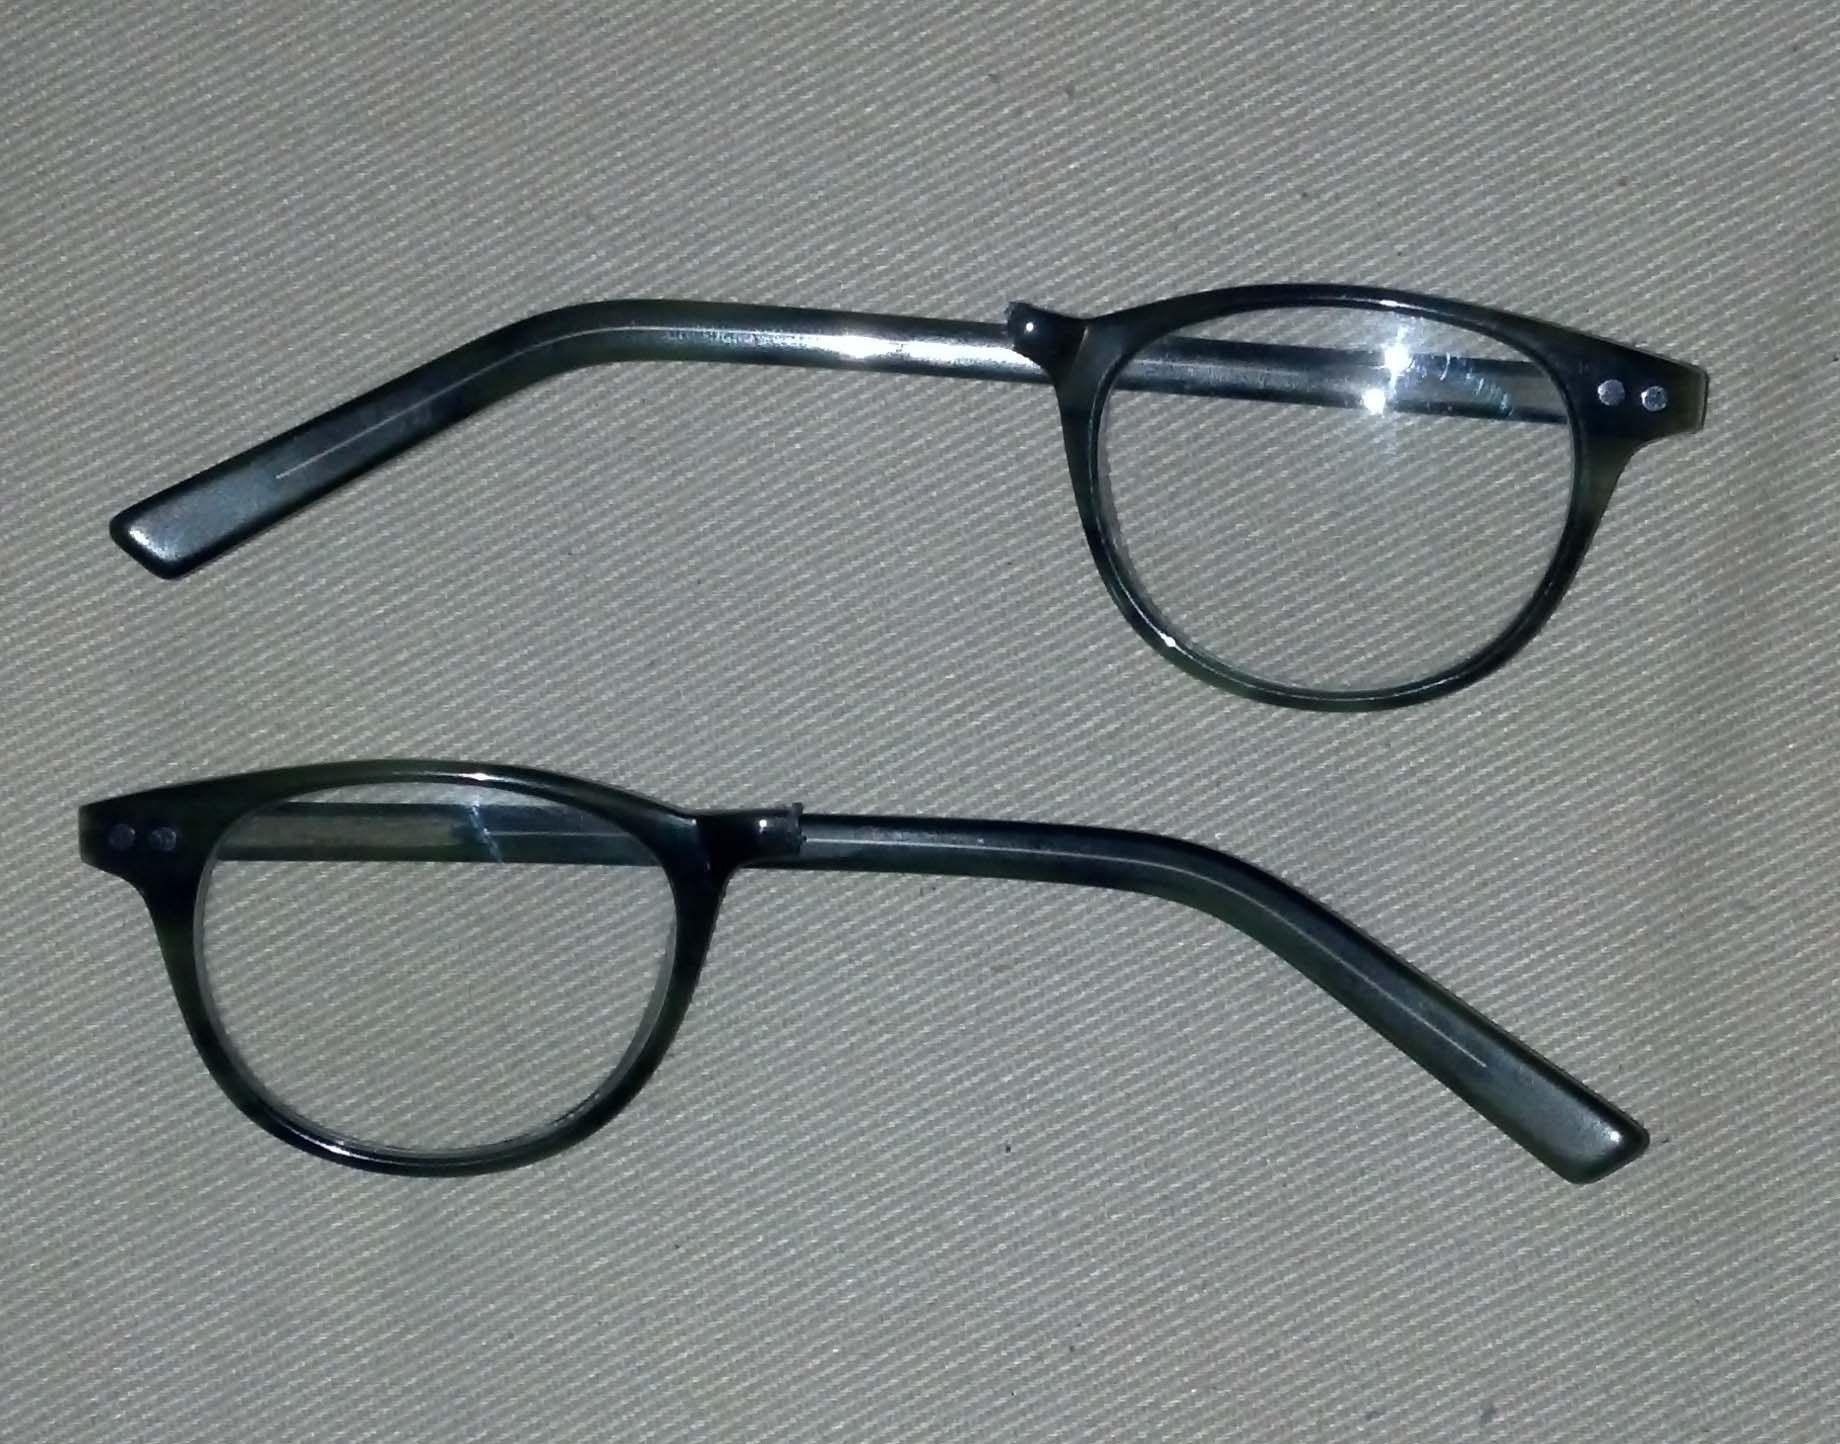 Before pic of green plastic eyeglass frame broken in